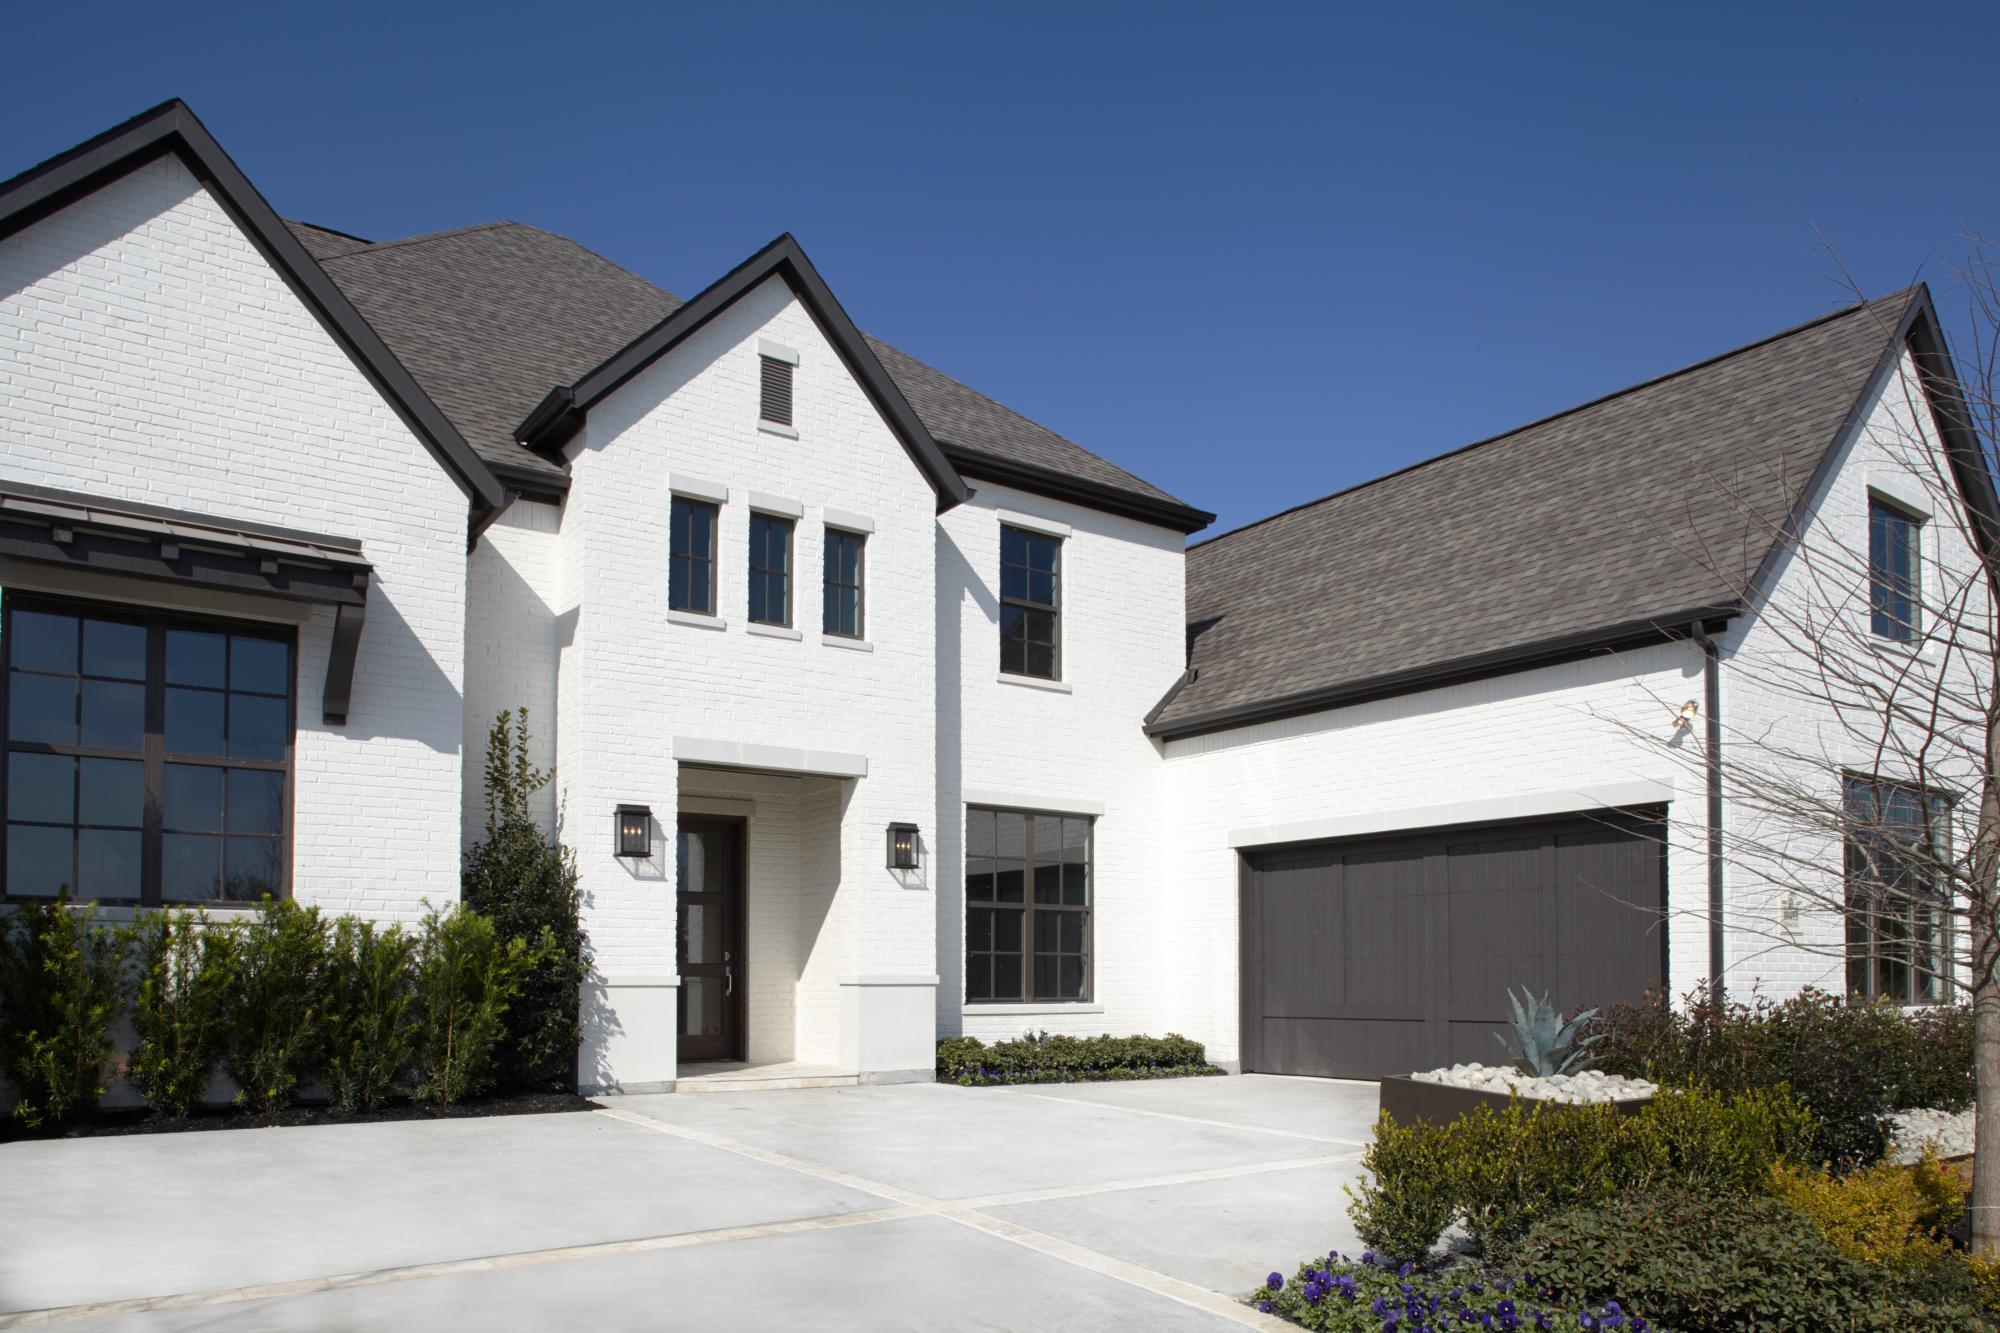 Single Family for Active at Sh 7232 10489 Mountain Laurel Lane Frisco, Texas 75034 United States